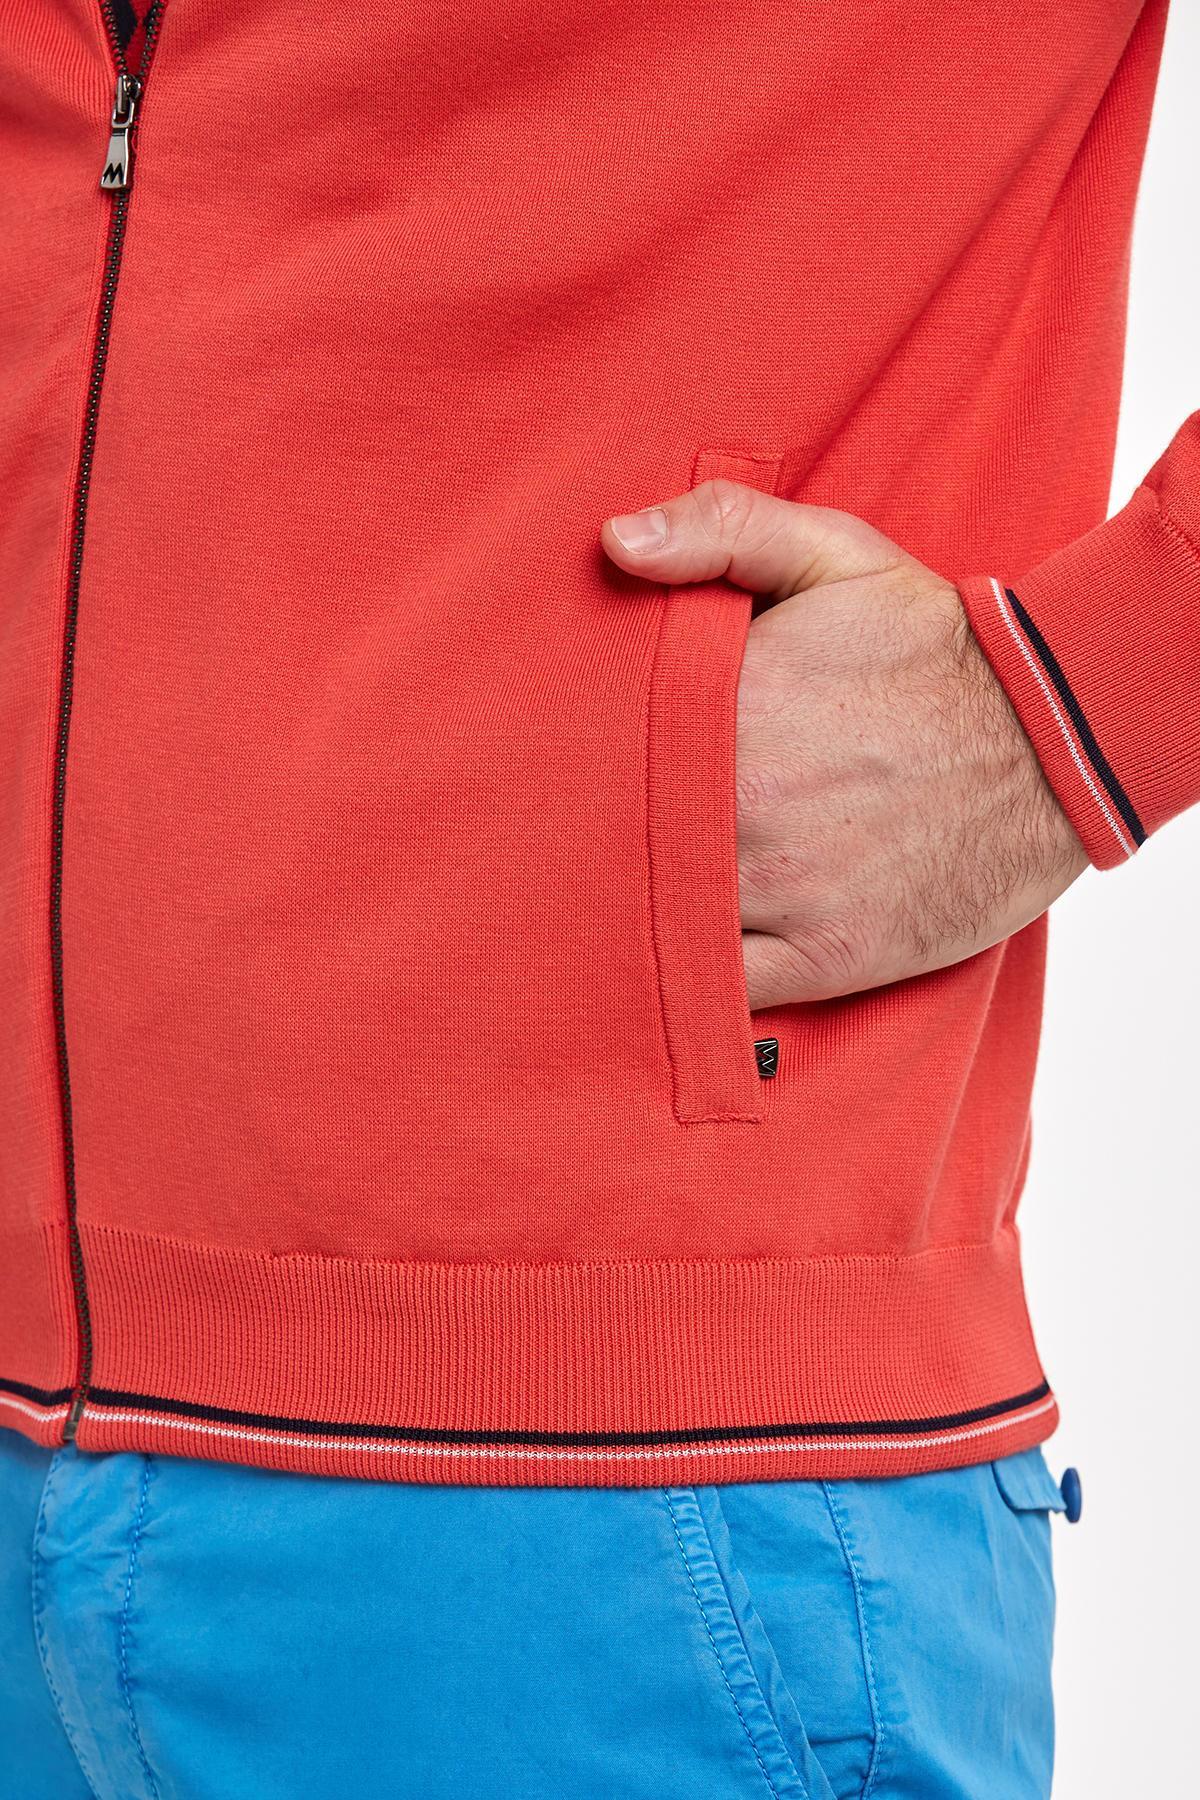 Giza Pamuk Kırmızı Spor Triko Bomber Ceket